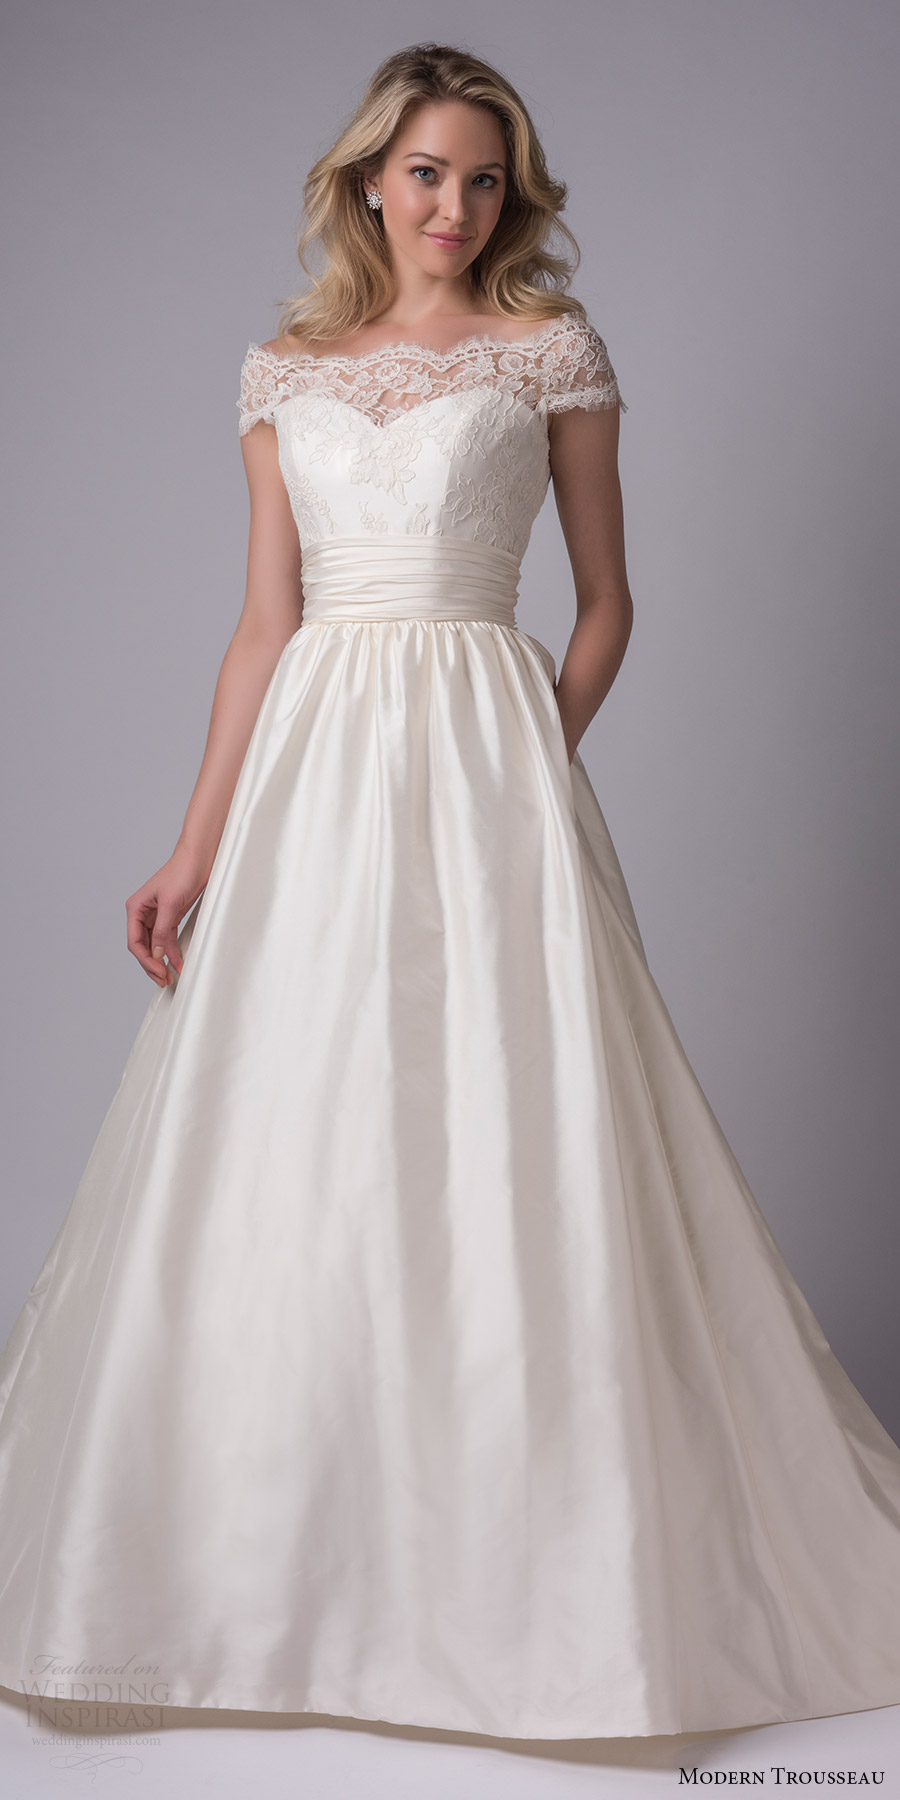 modern trousseau bridal fall 2017 off shoulder lace bodice ball gown wedding dress (nissa) mv ruched waistband thai silk skirt pockets